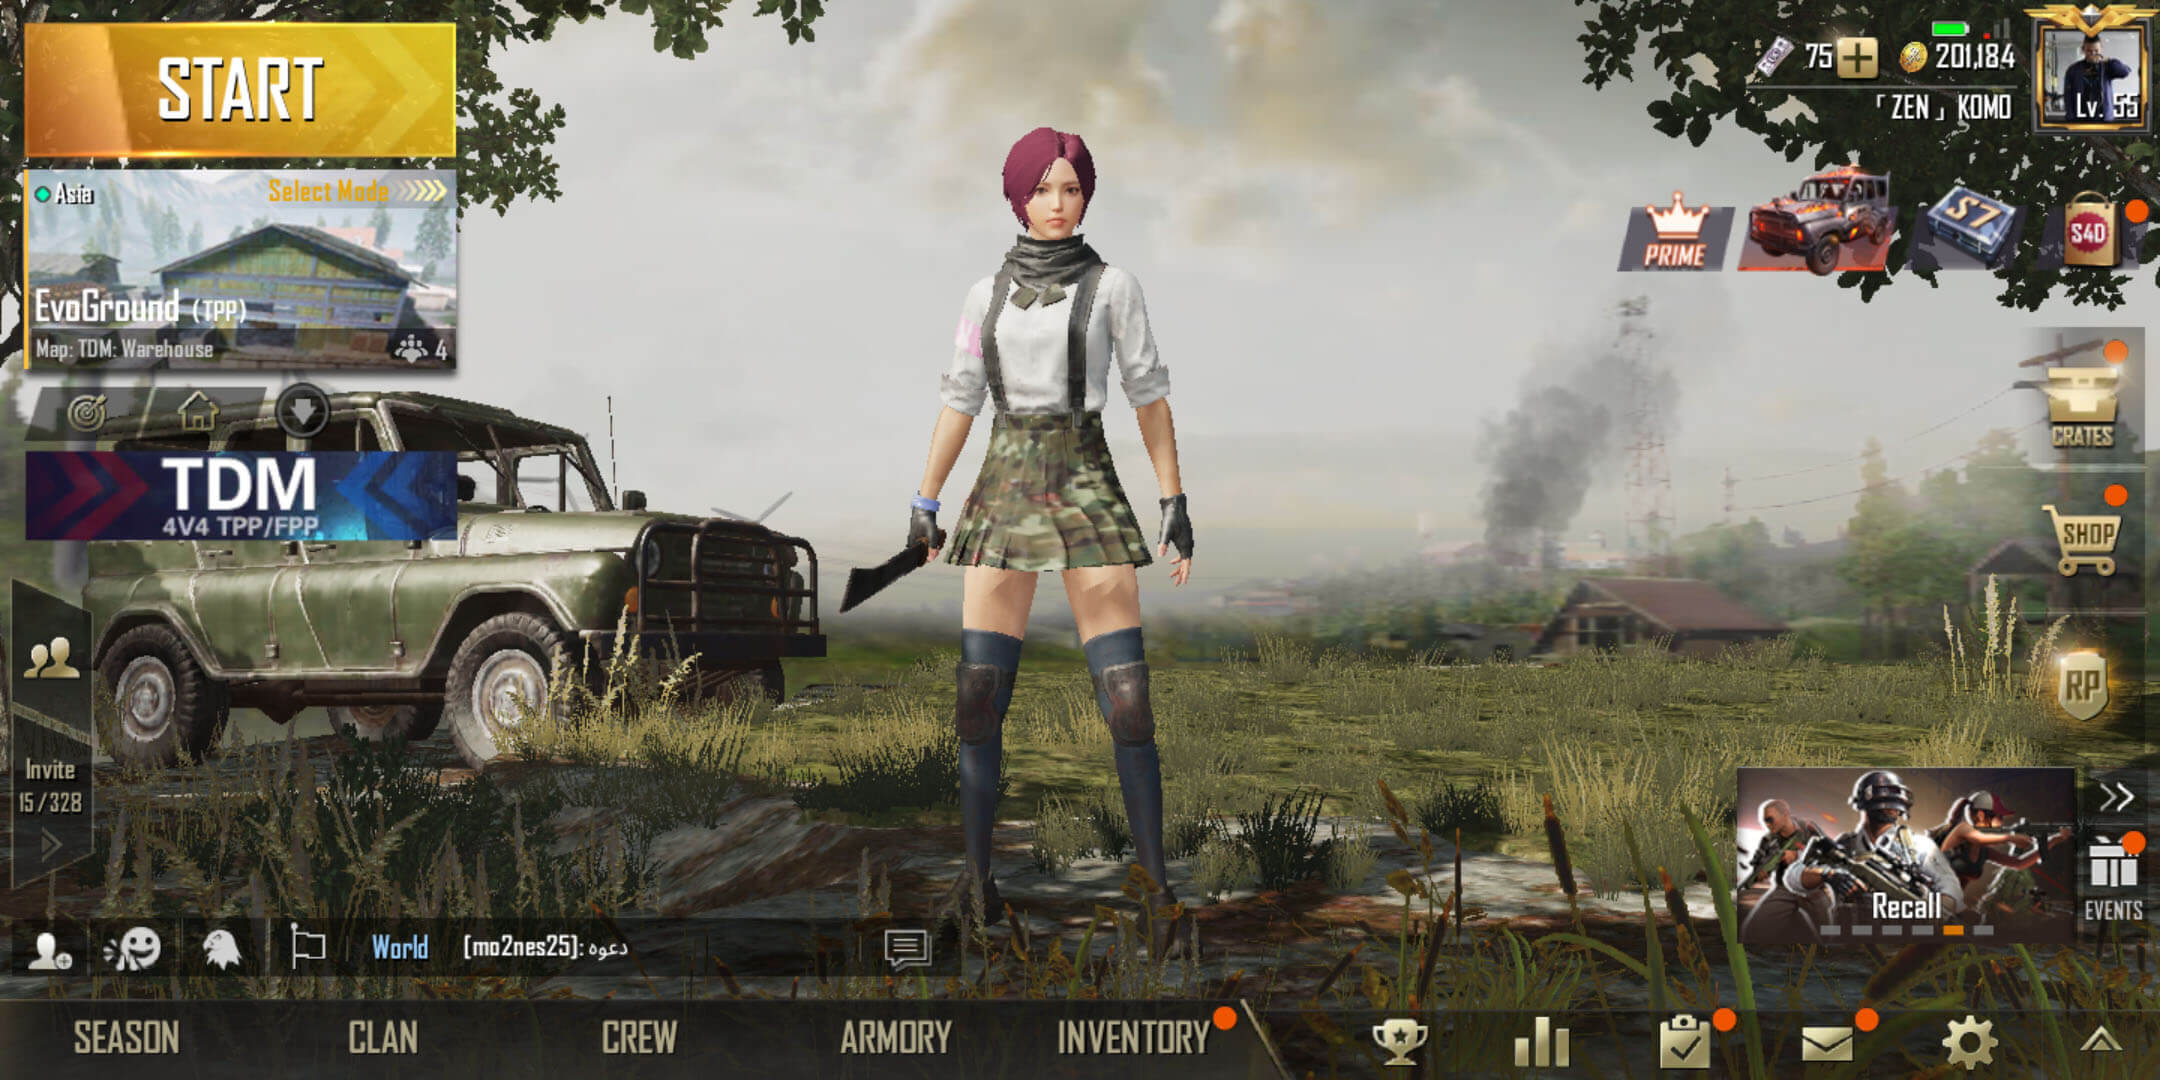 Cara Top Up PUBG Mobile Via Pulsa - Lobby Game PUBG